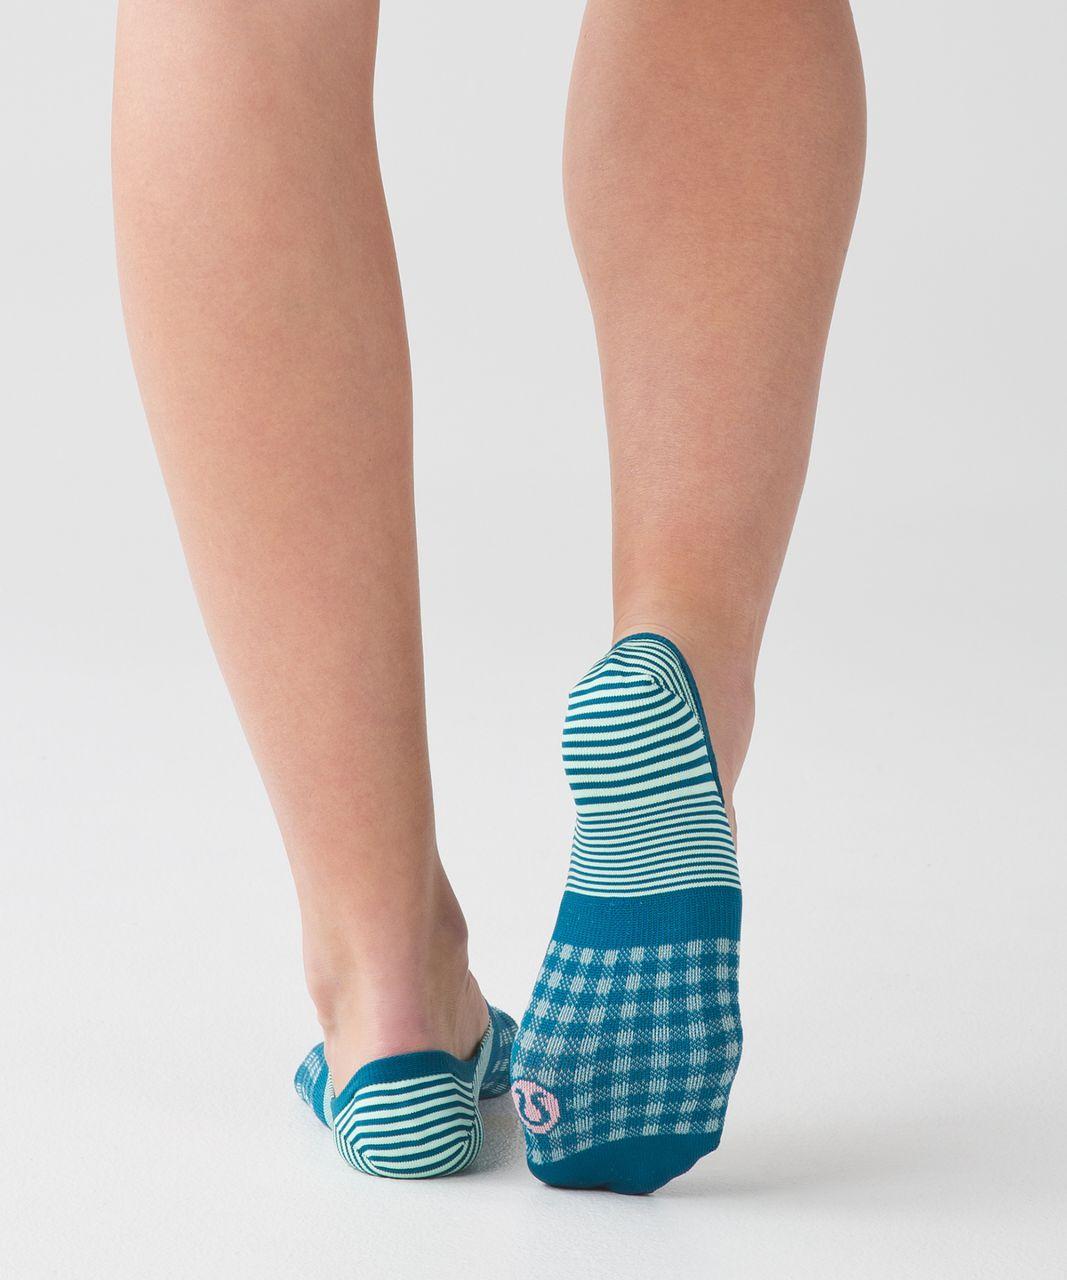 Lululemon Secret Sock - Tofino Teal / Fresh Teal